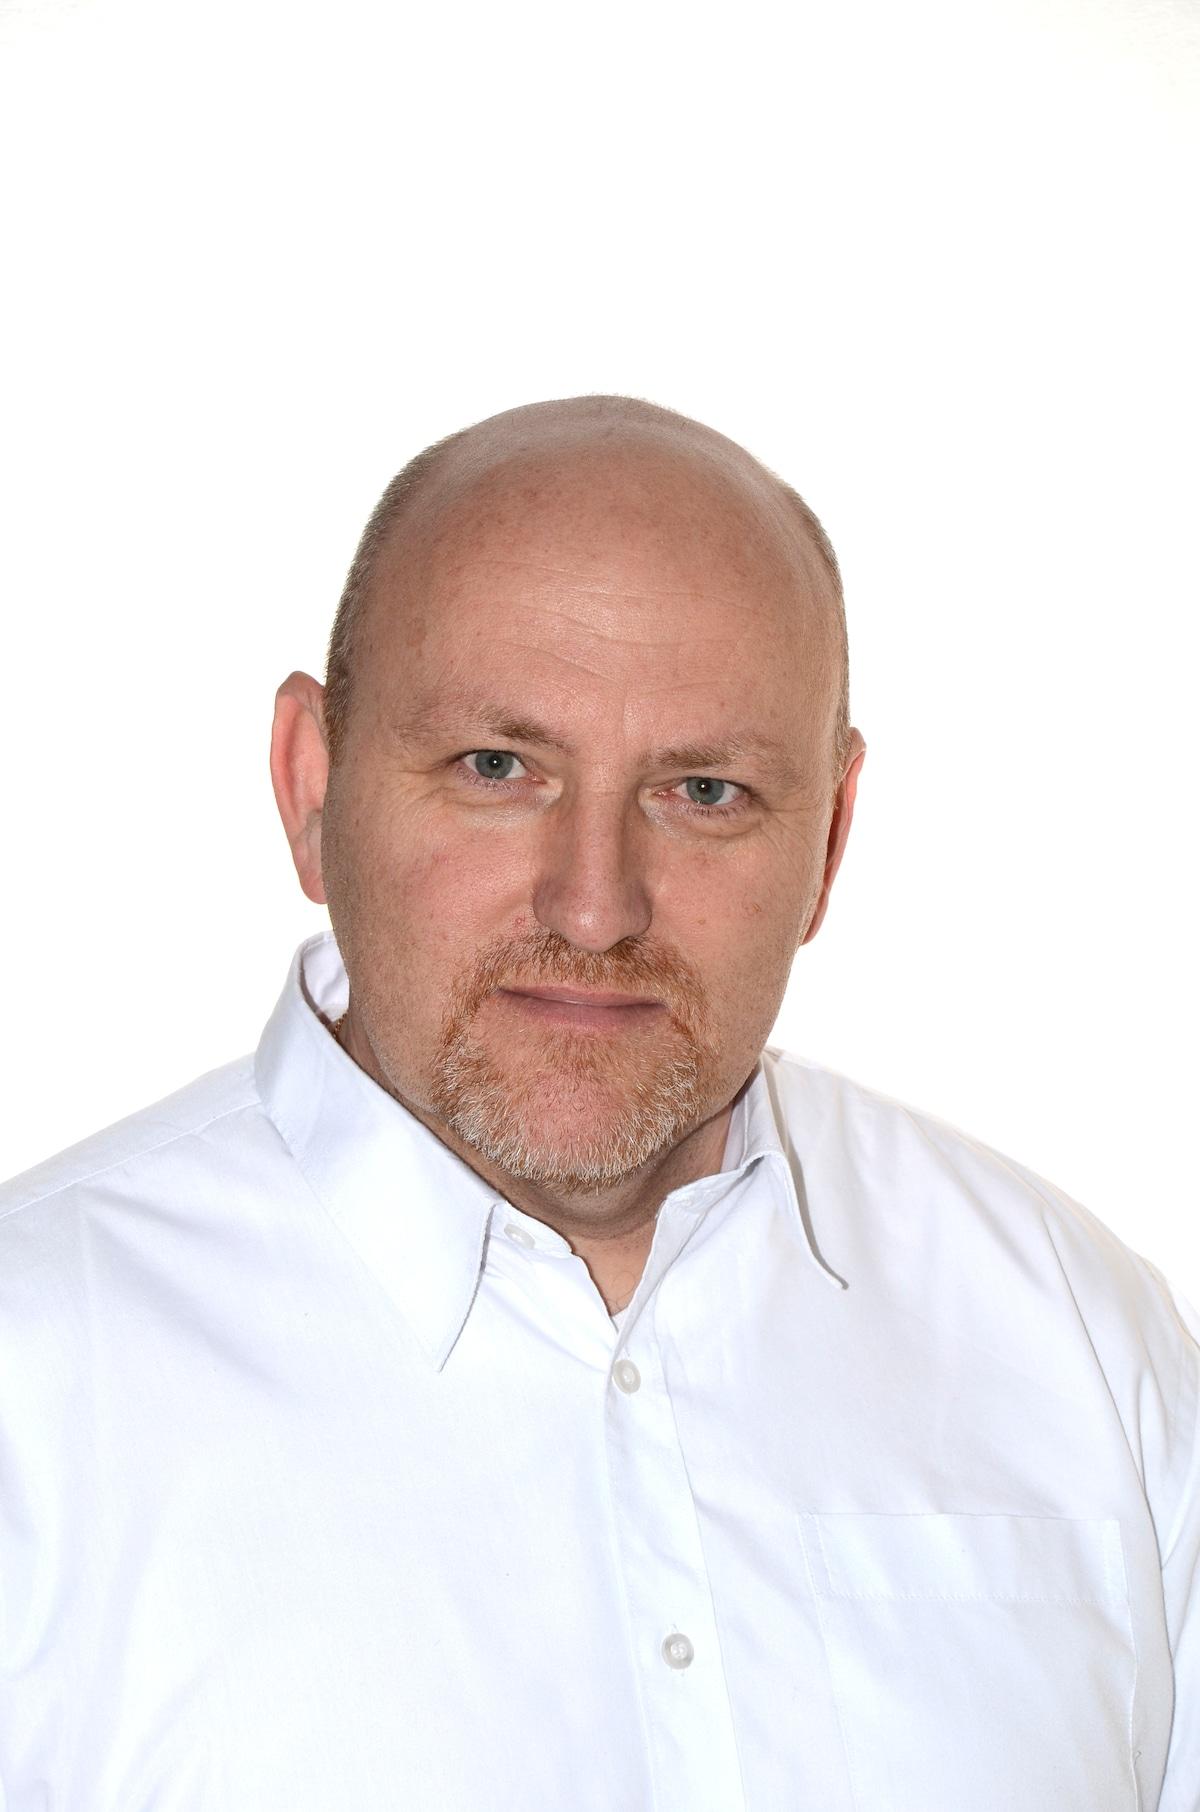 Miklós From Debrecen, Hungary